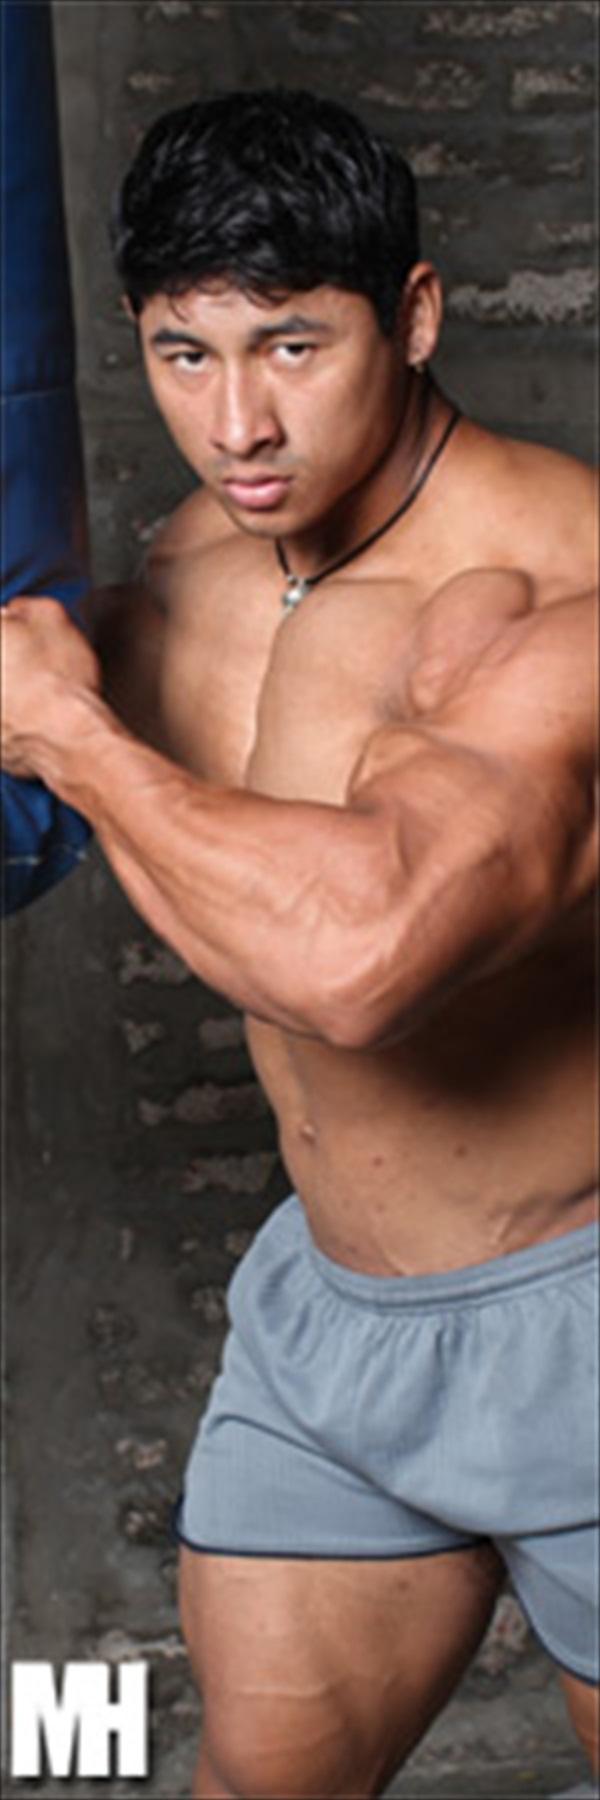 Camo - Page 16 - Bodybuilders Inc.